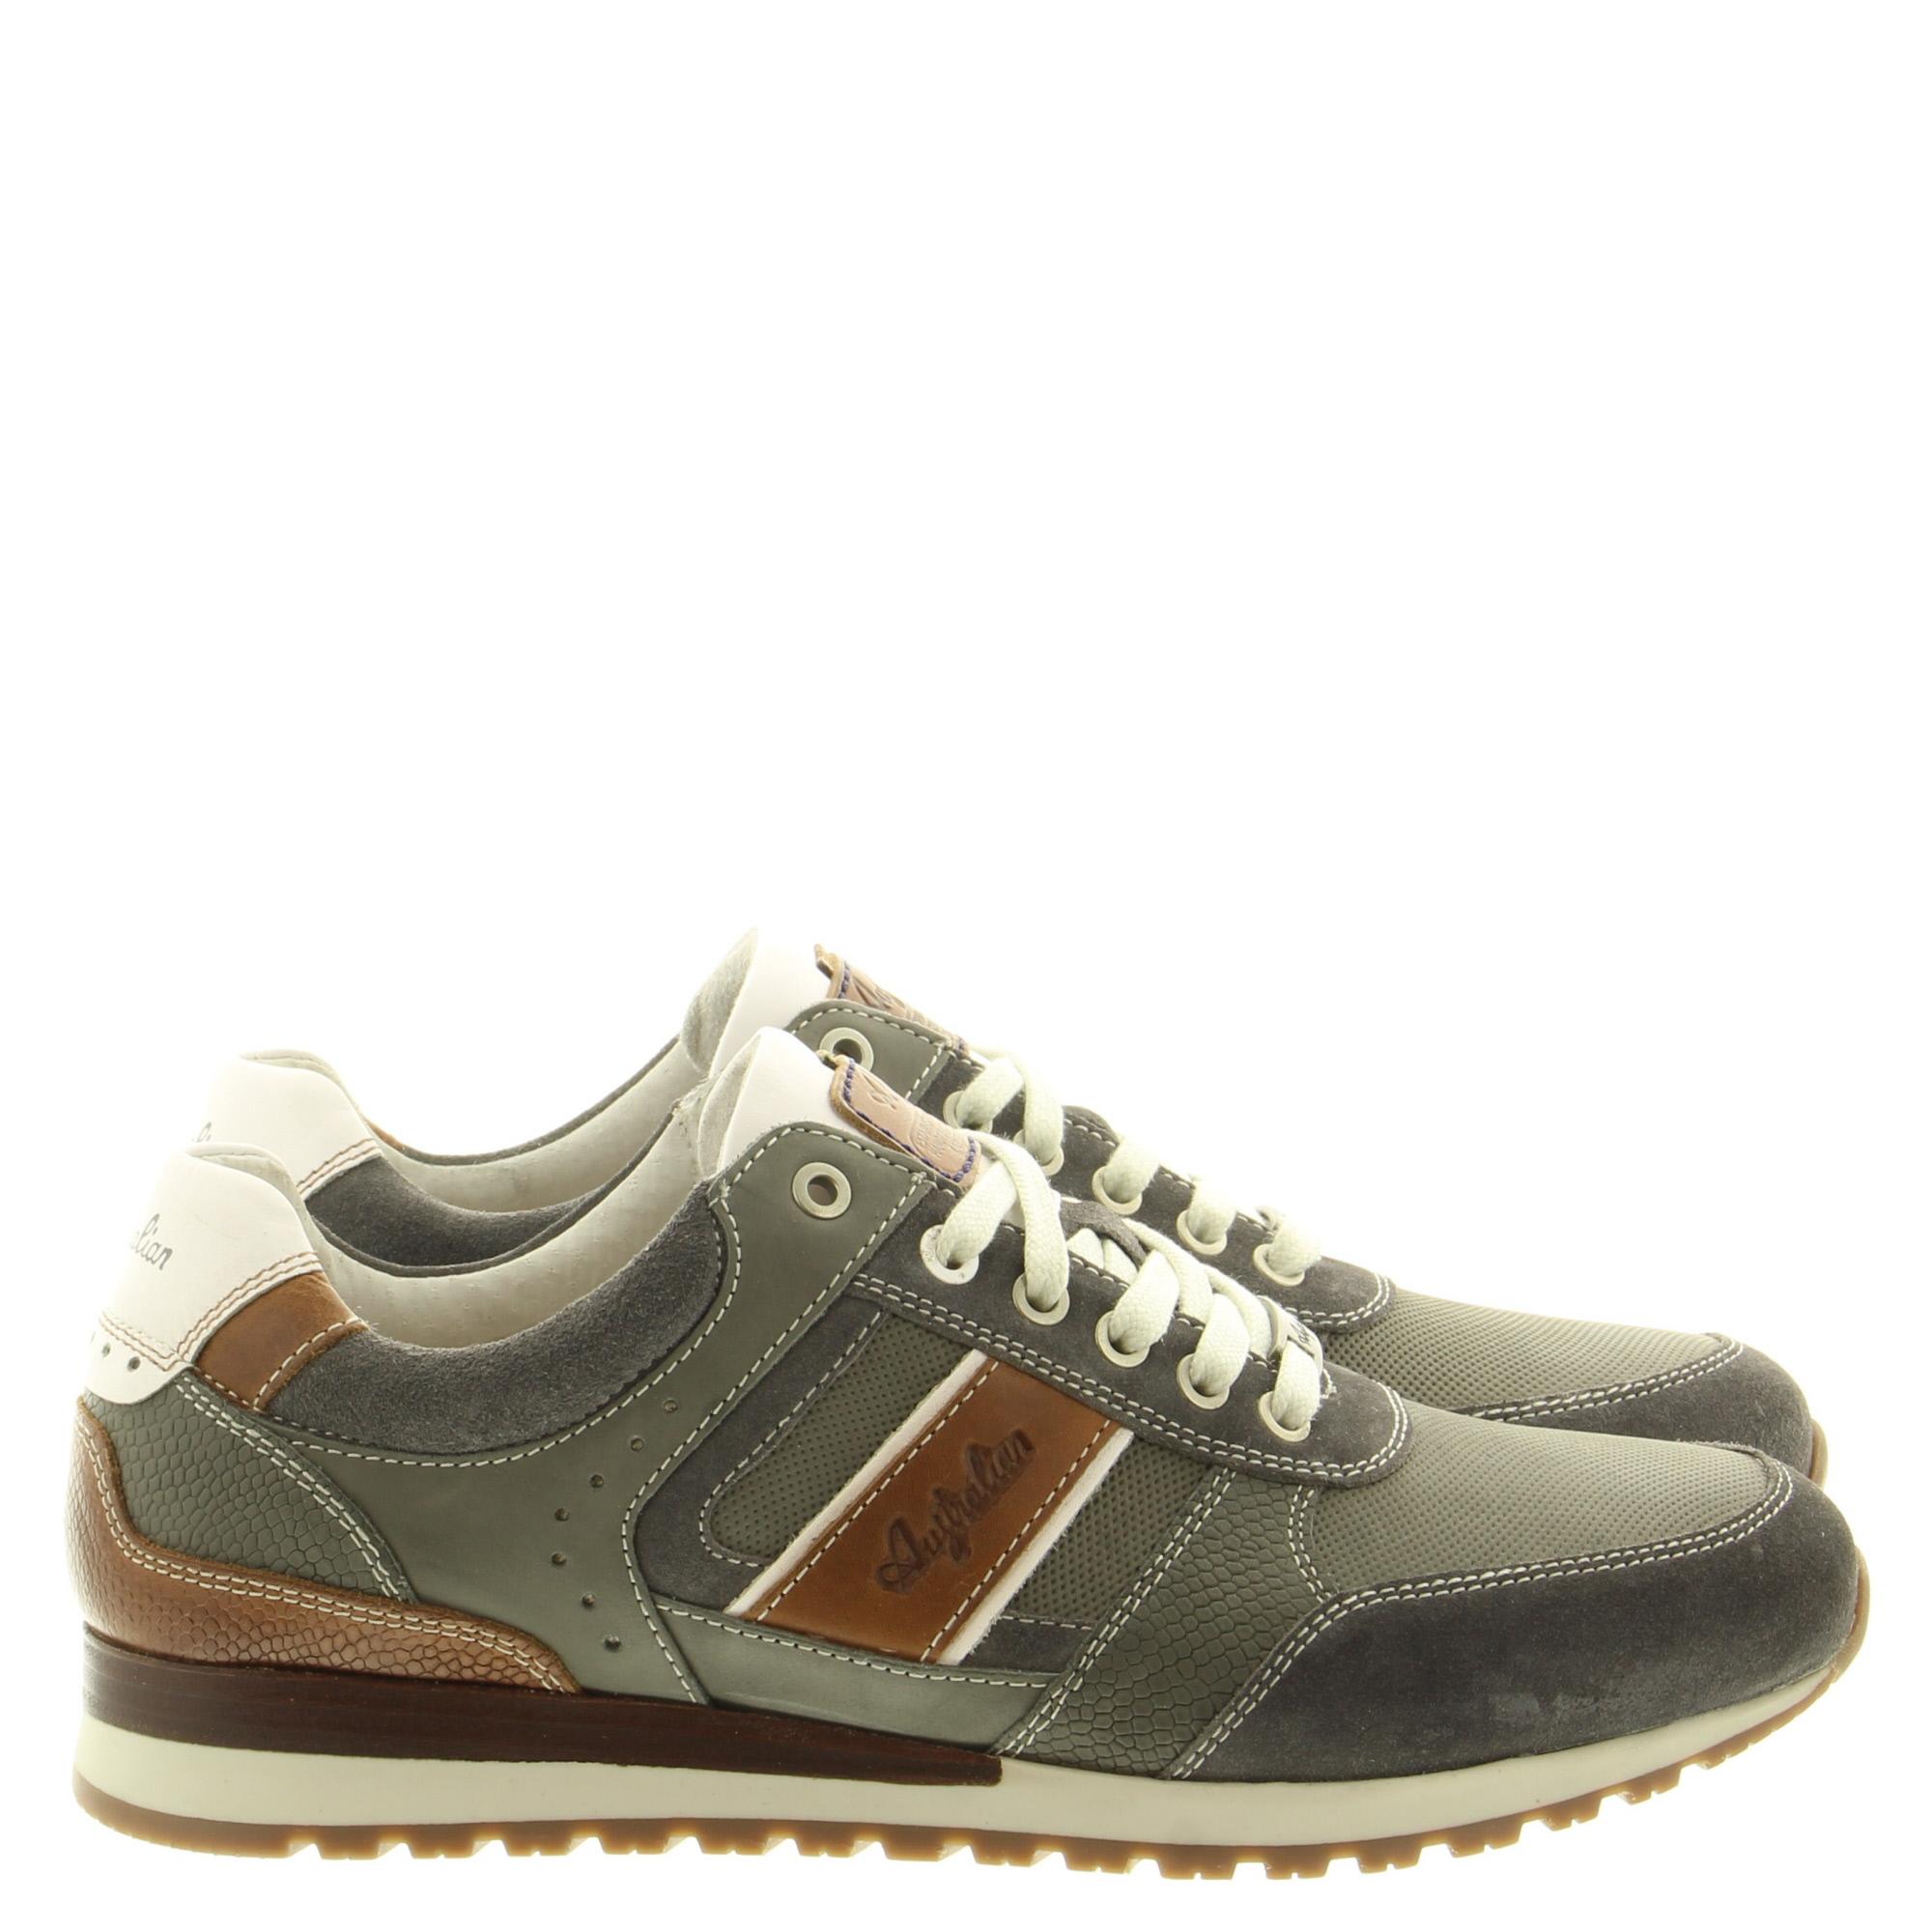 Australian Footwear Condor 15.1504.02 PKV Grey-White-Tan